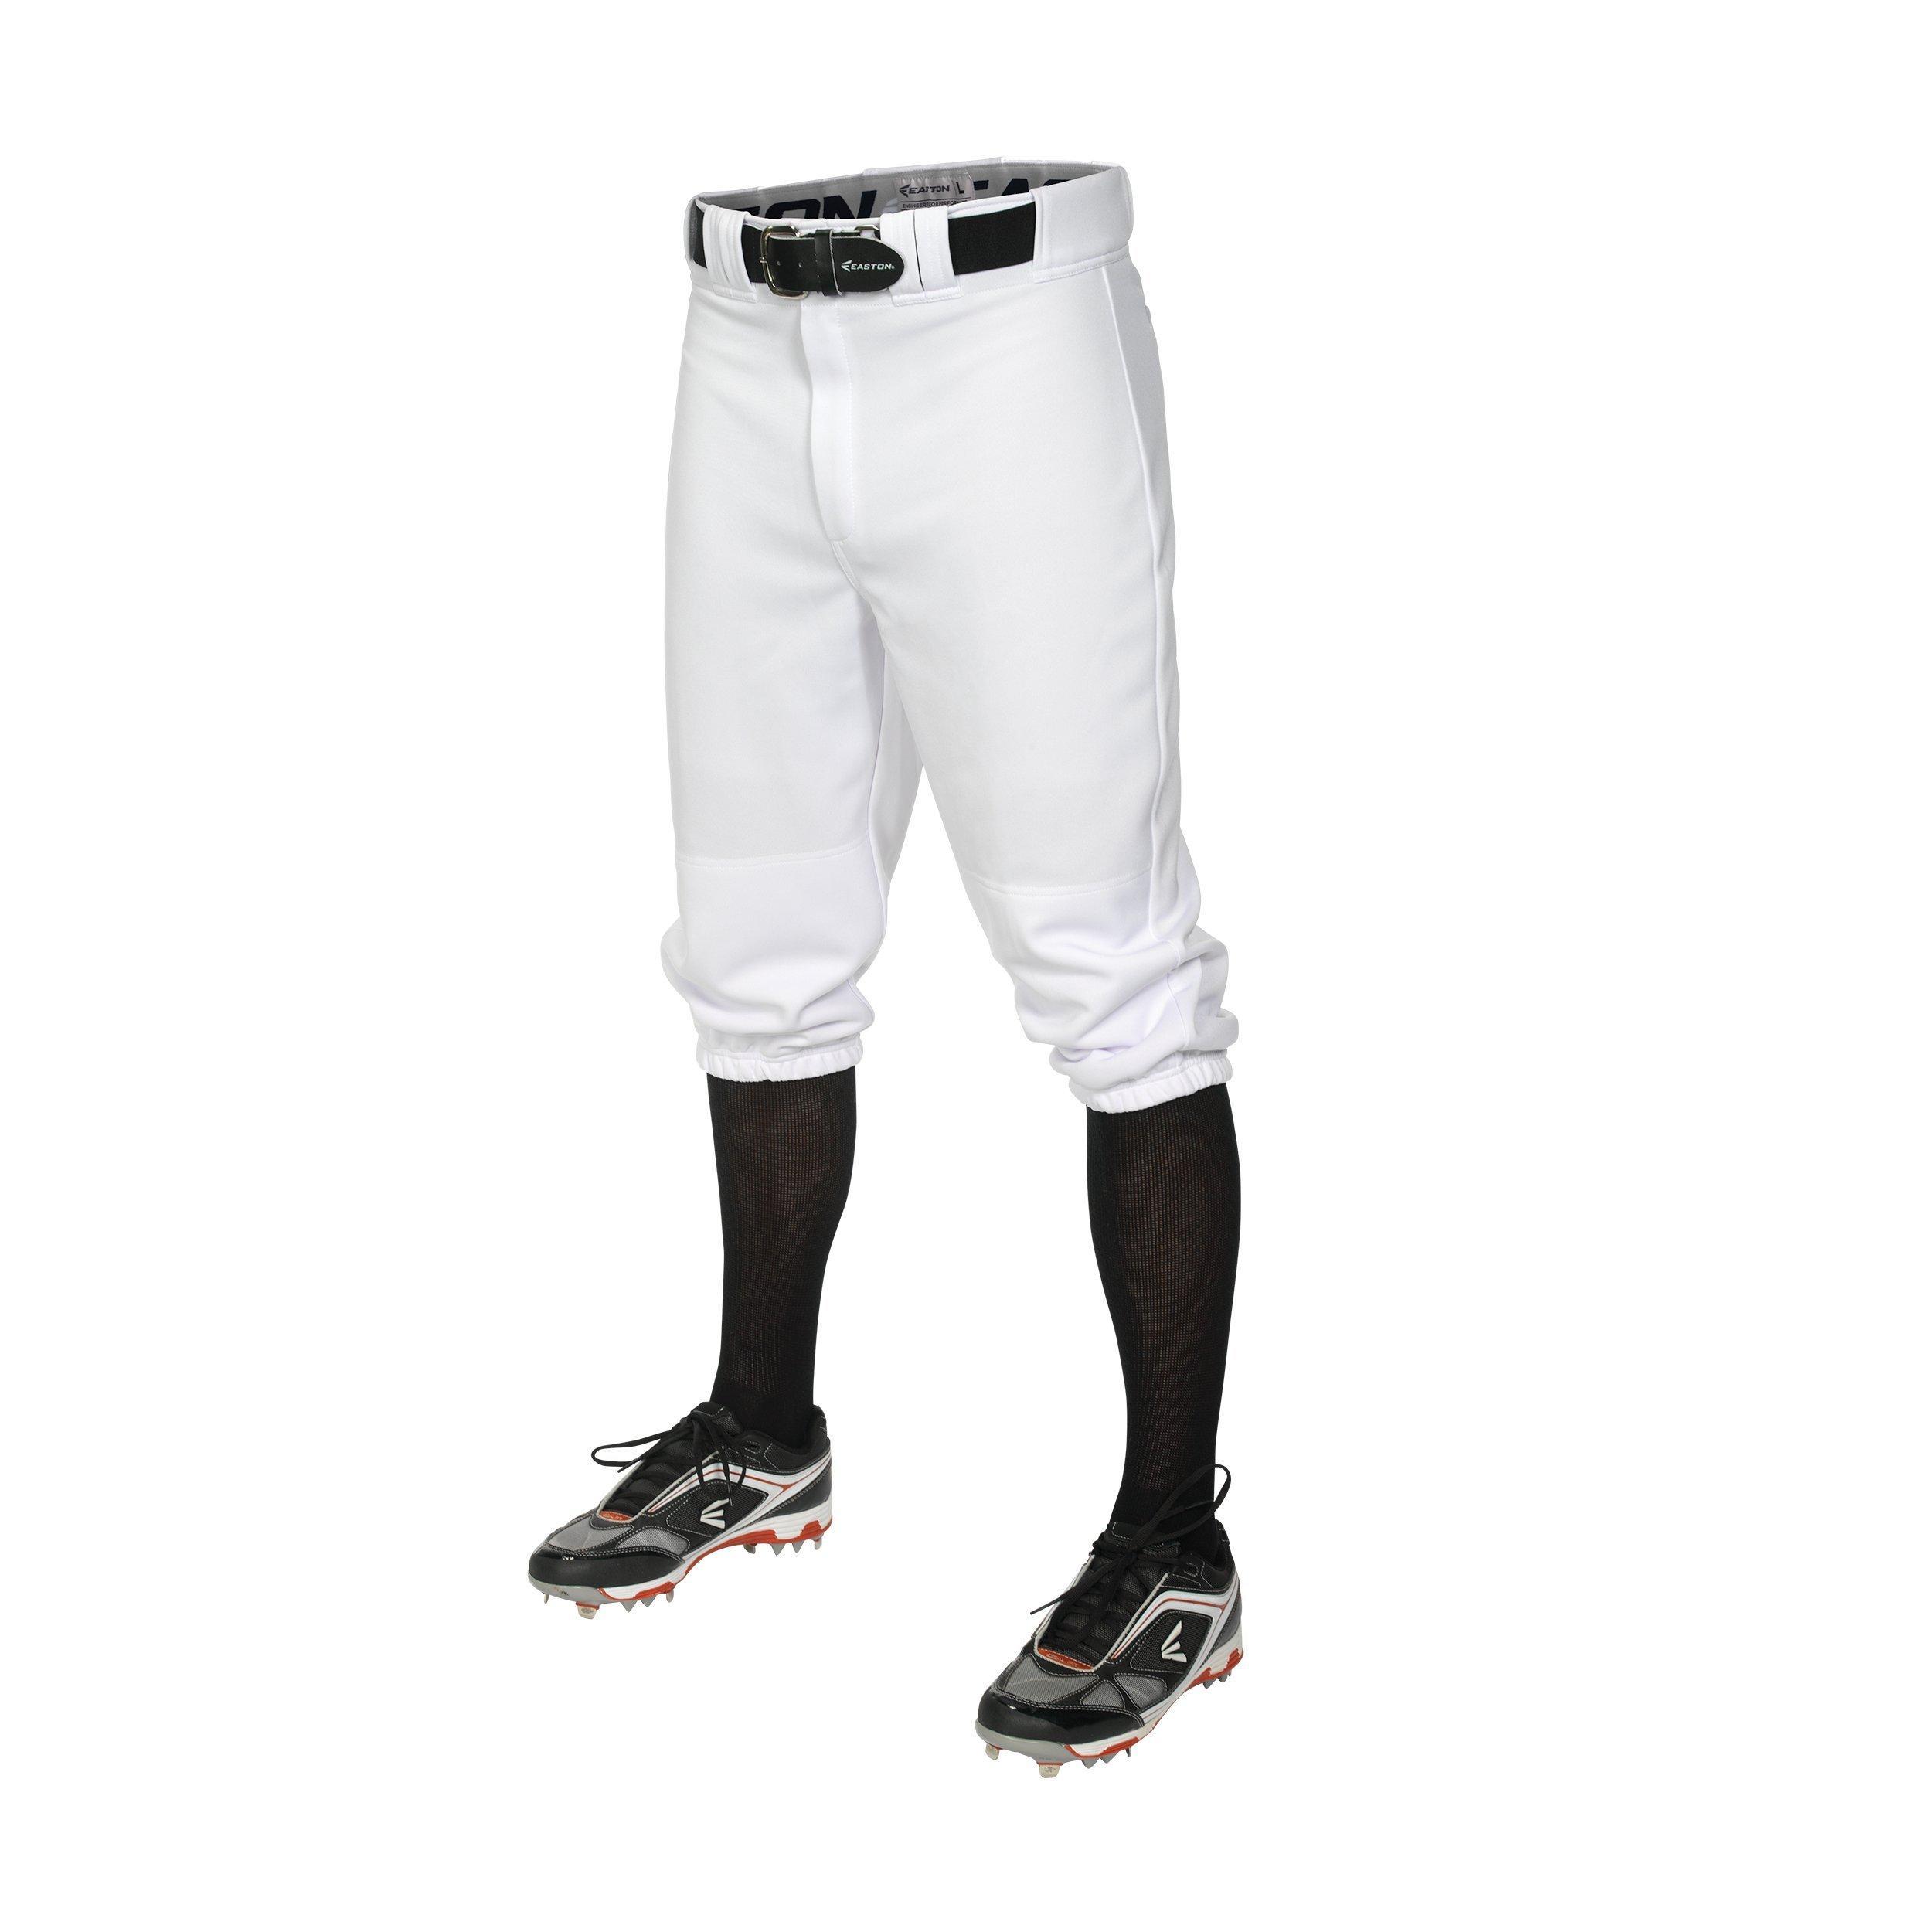 White gray view size chart also pro knicker pants easton rh